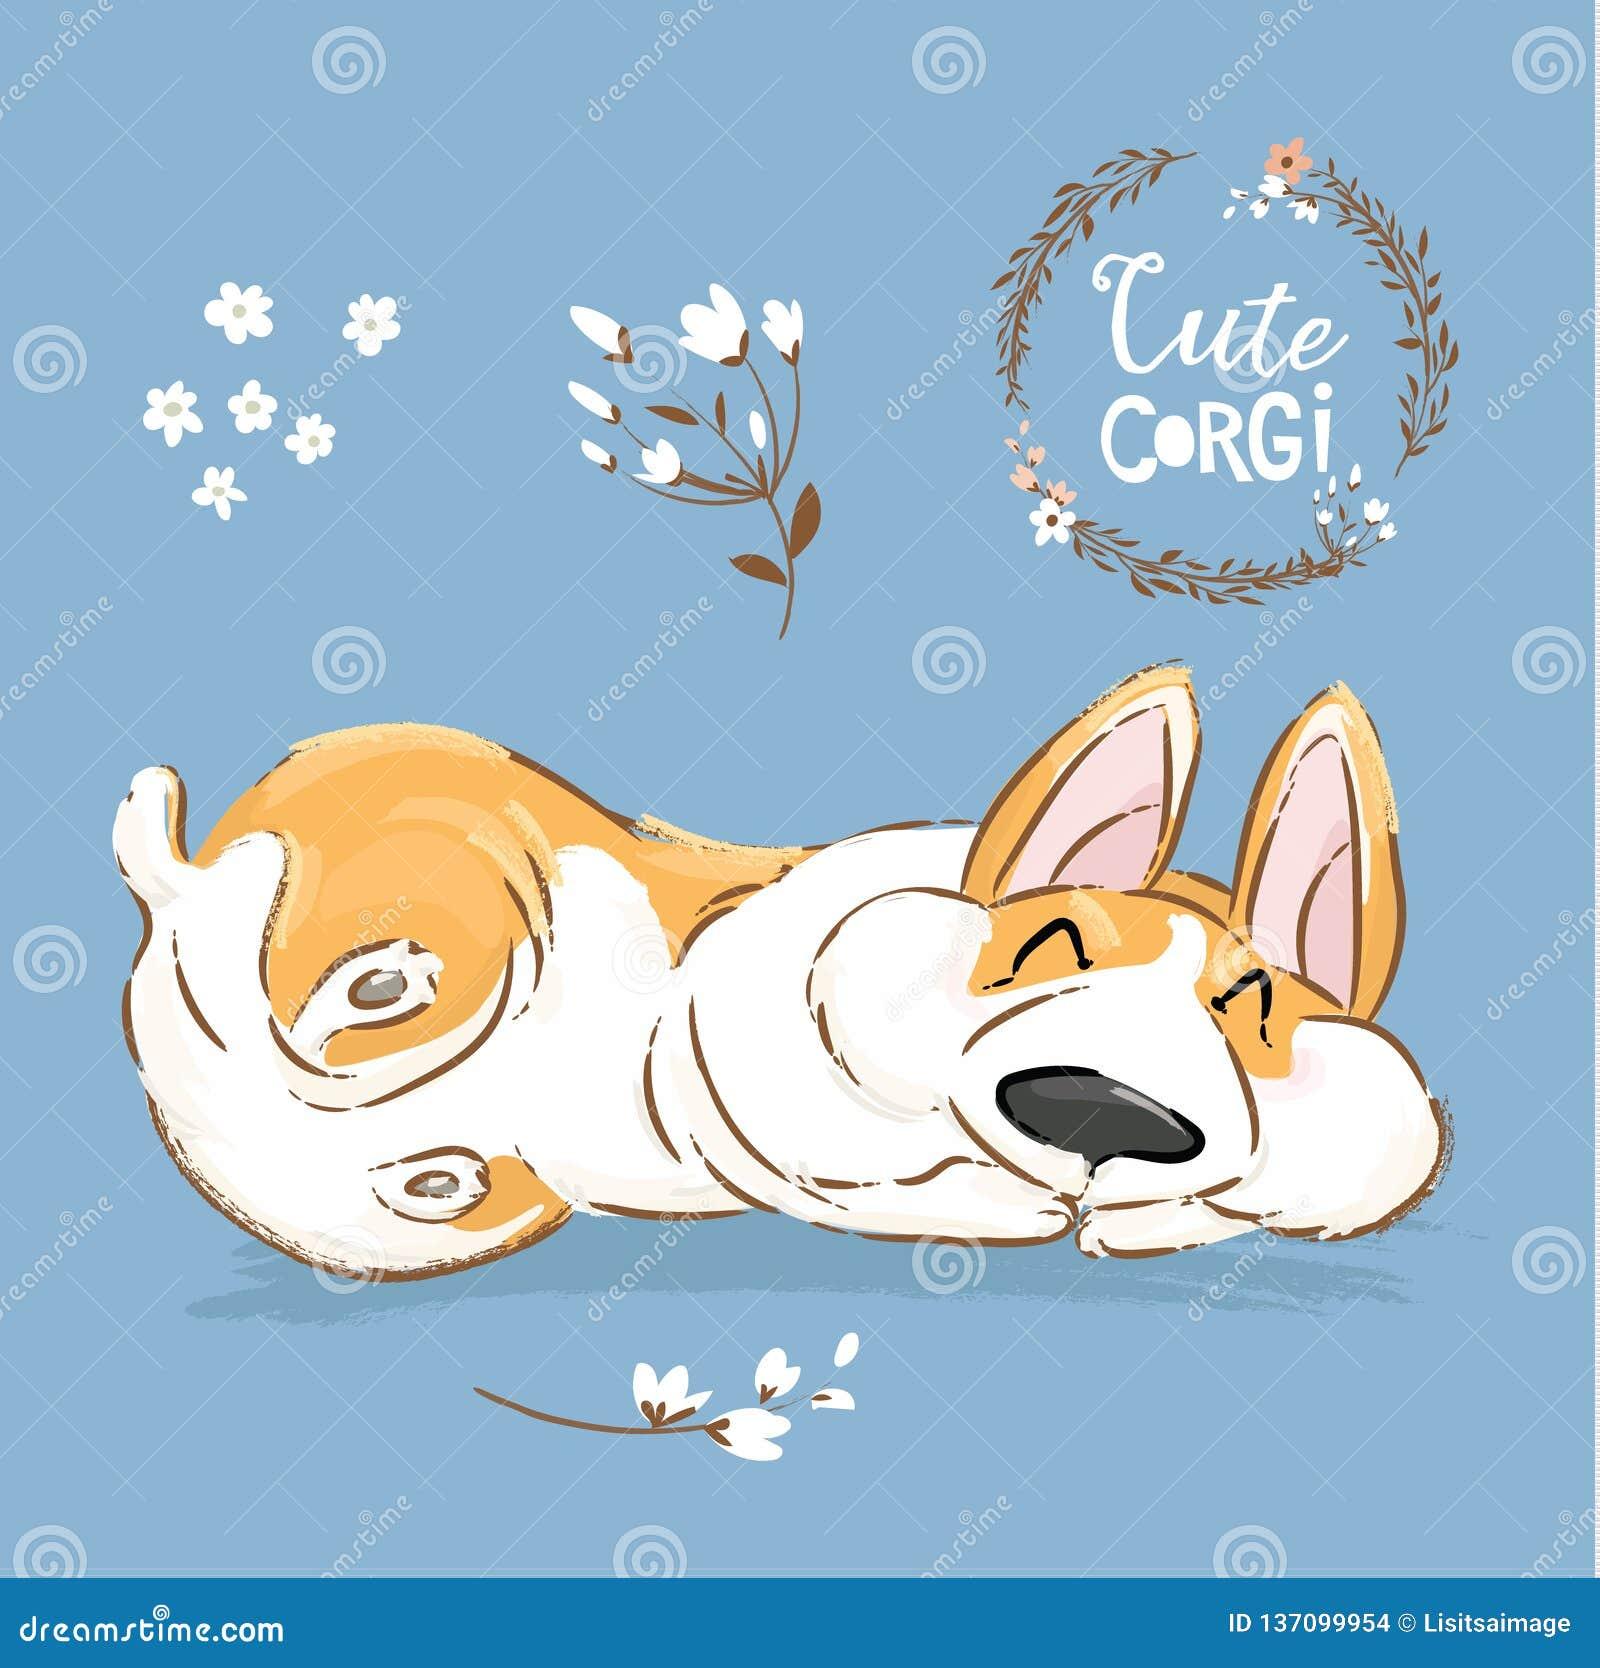 Cute Corgi Dog Puppy Sleep Vector Banner. Welsh Short Fox Pet Character Rest Pose Poster. Little Cheerful Brown Doggy